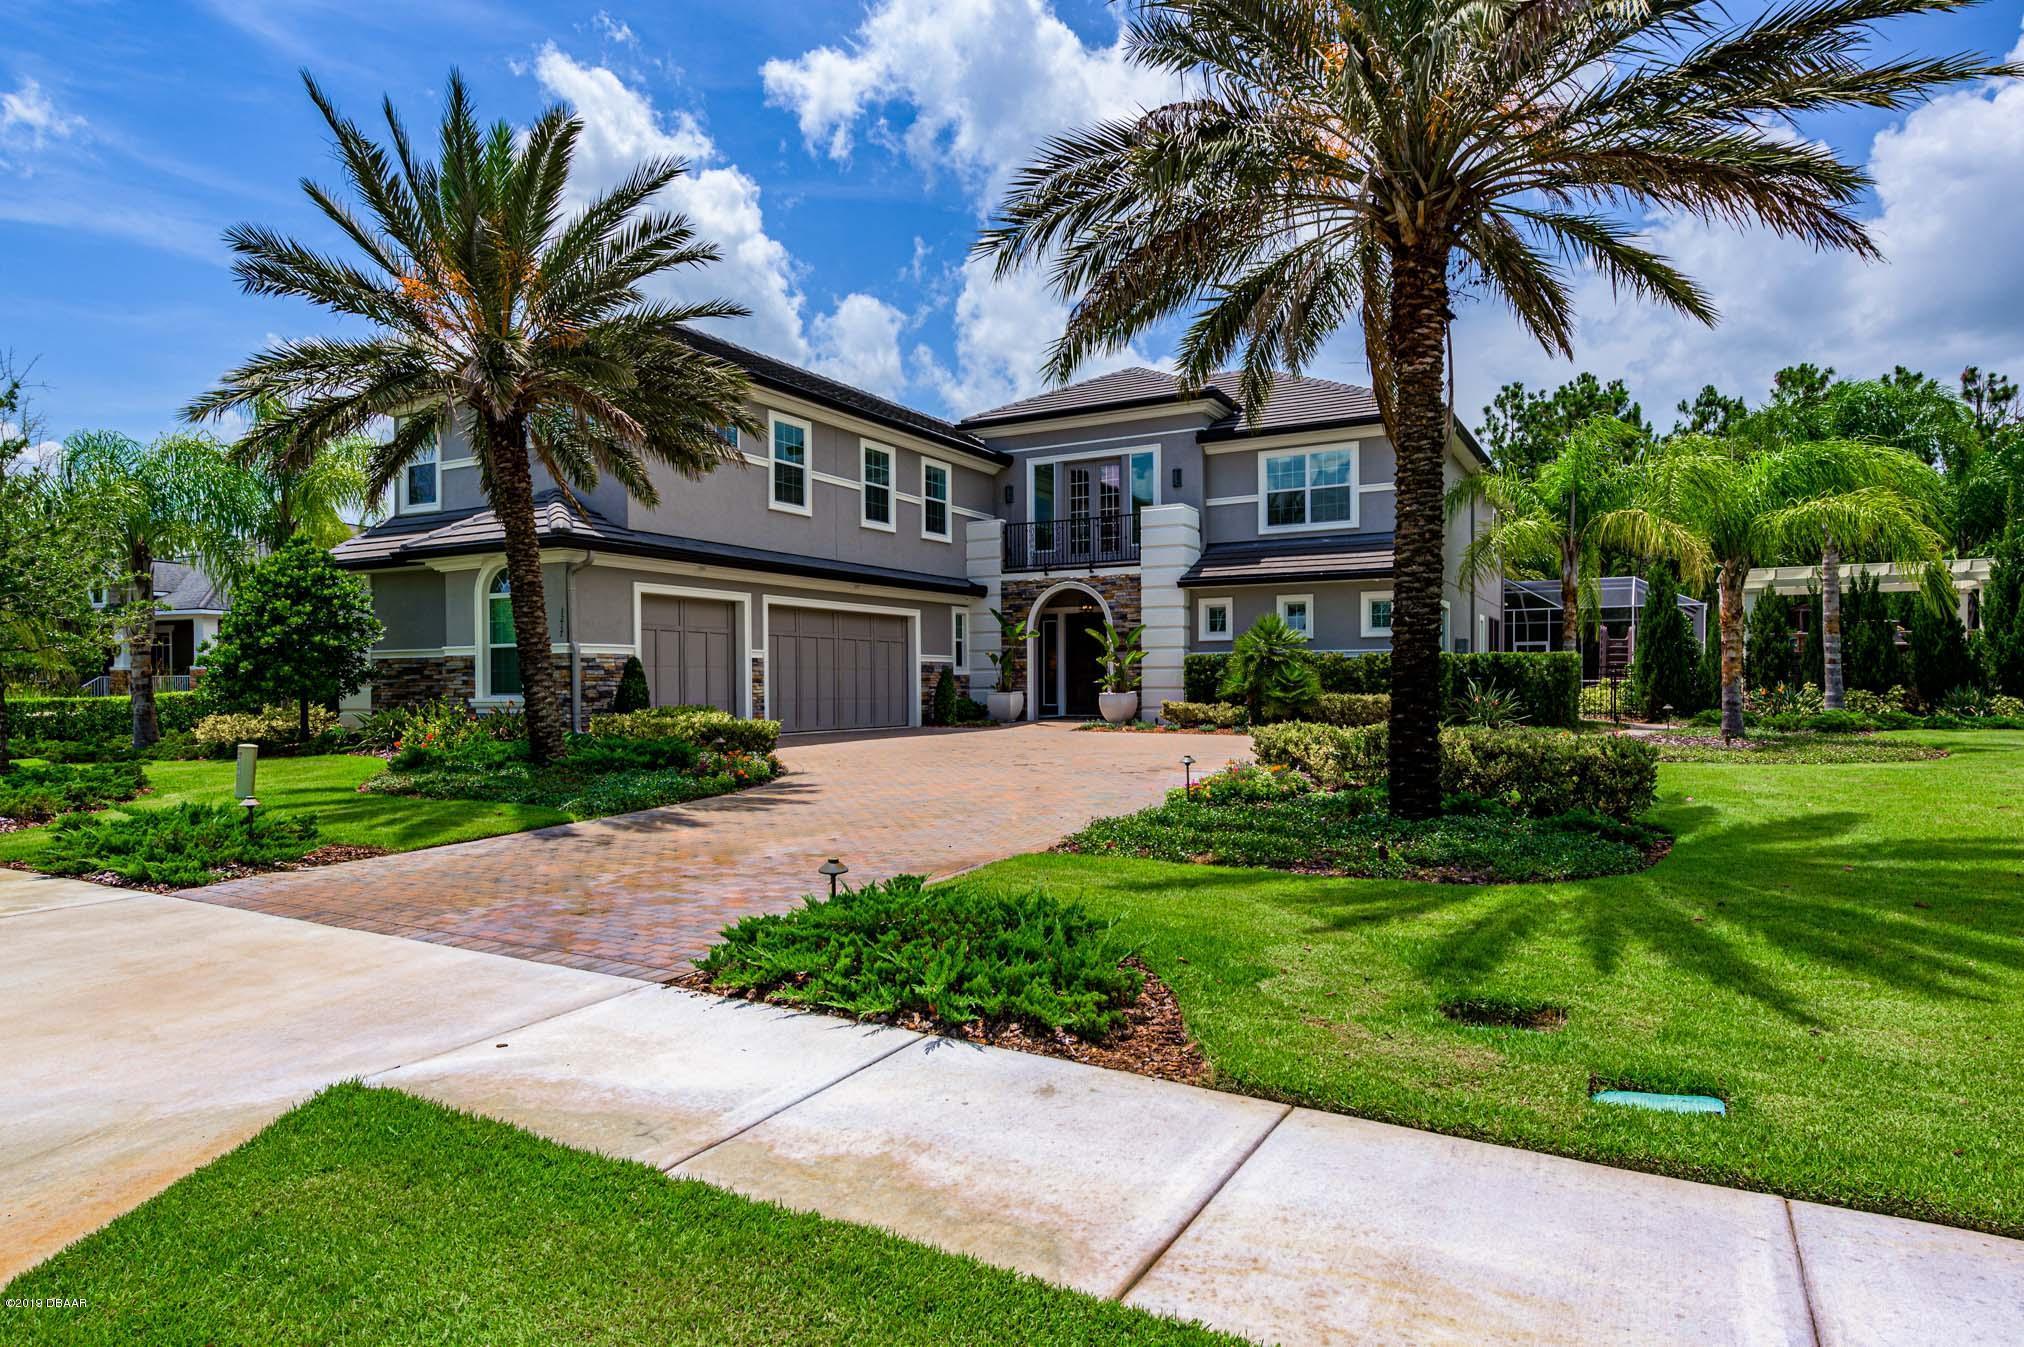 1217 Draycott Street, Ormond Beach, Florida